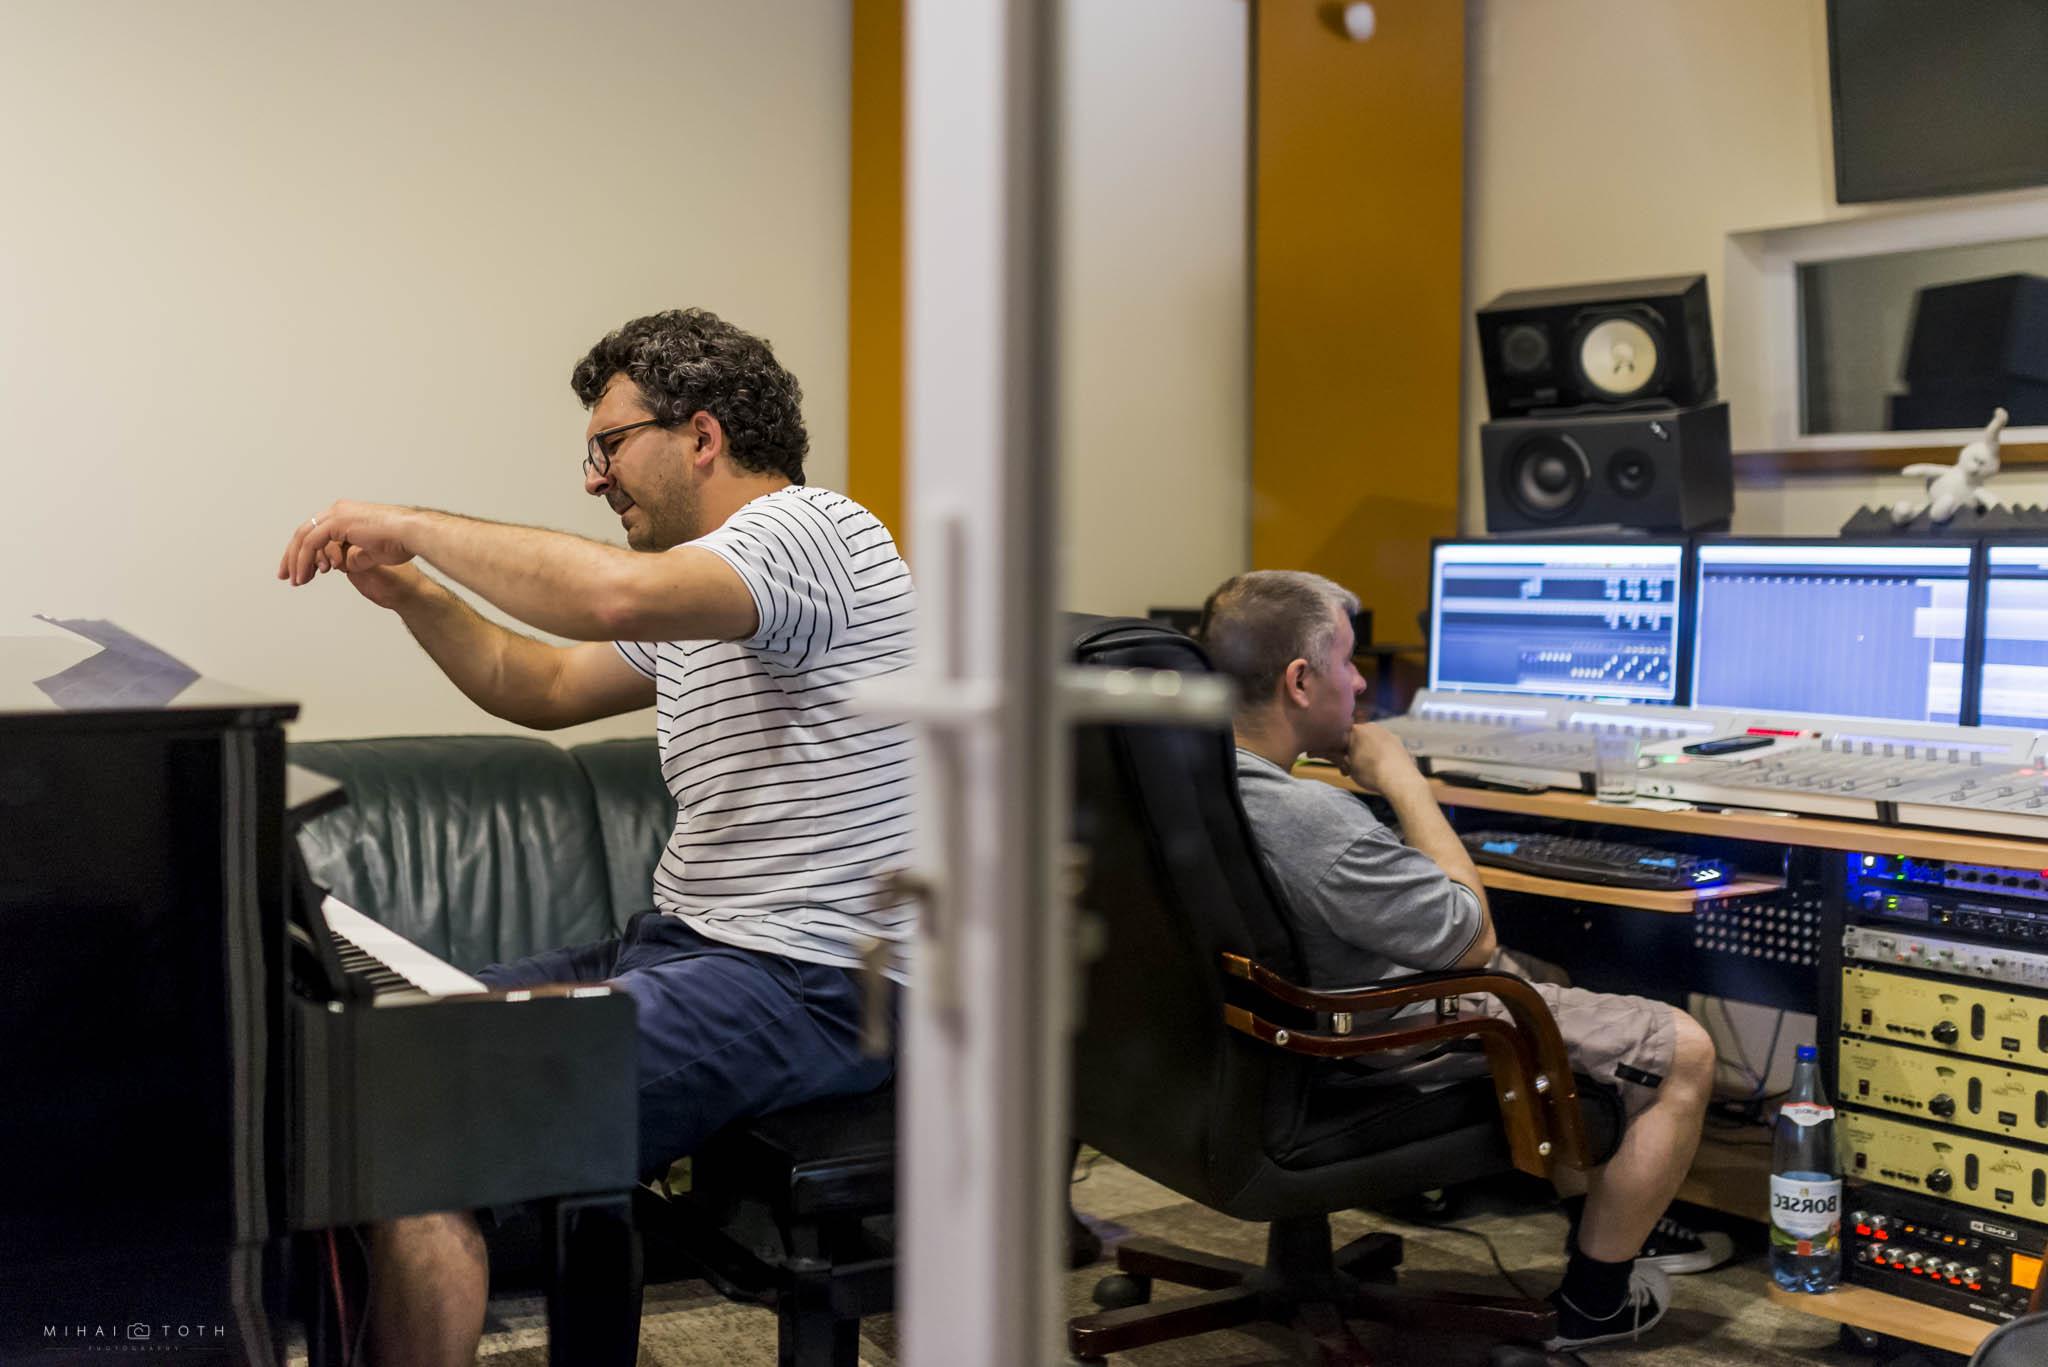 Working in the recording studio